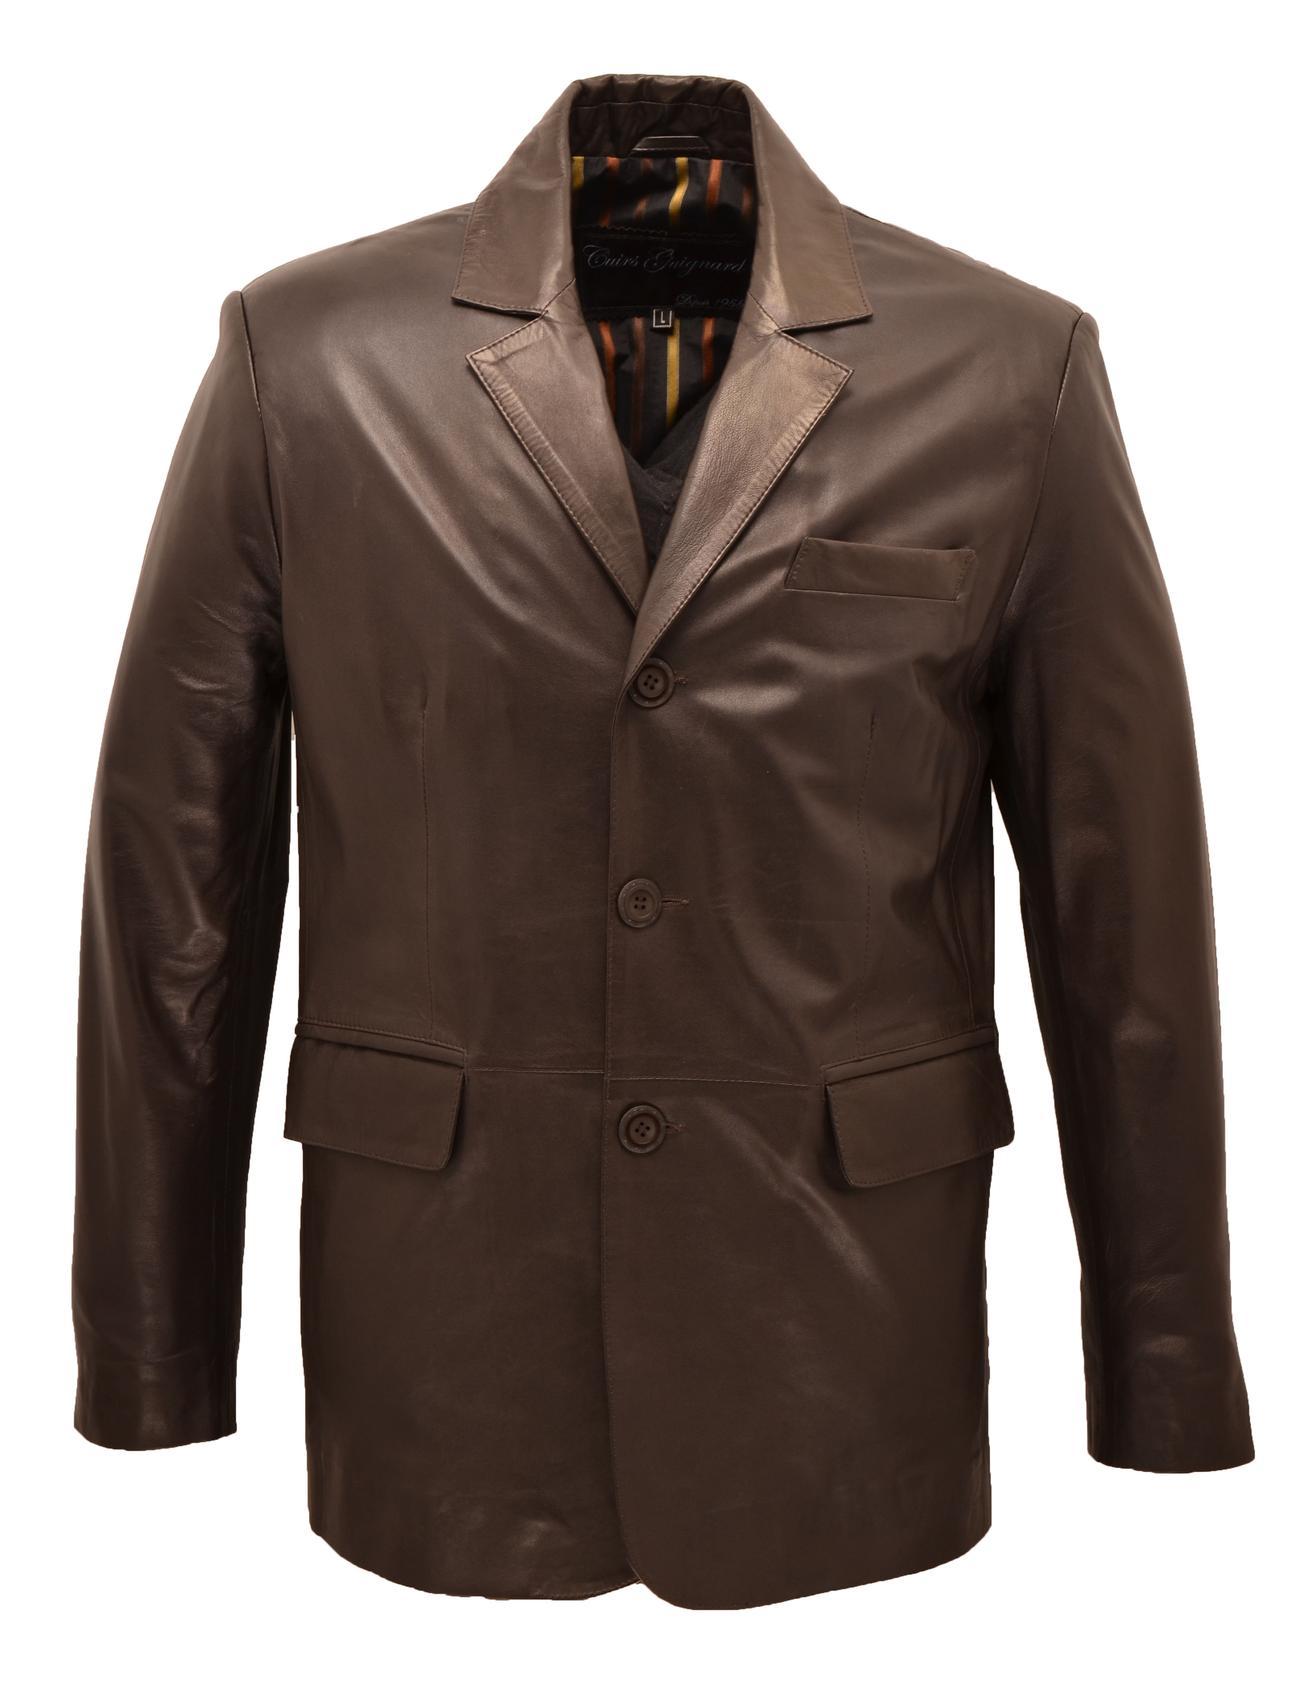 Vestes cuirs guignard en cuir agneau ref julien marron - Blazer homme marron ...